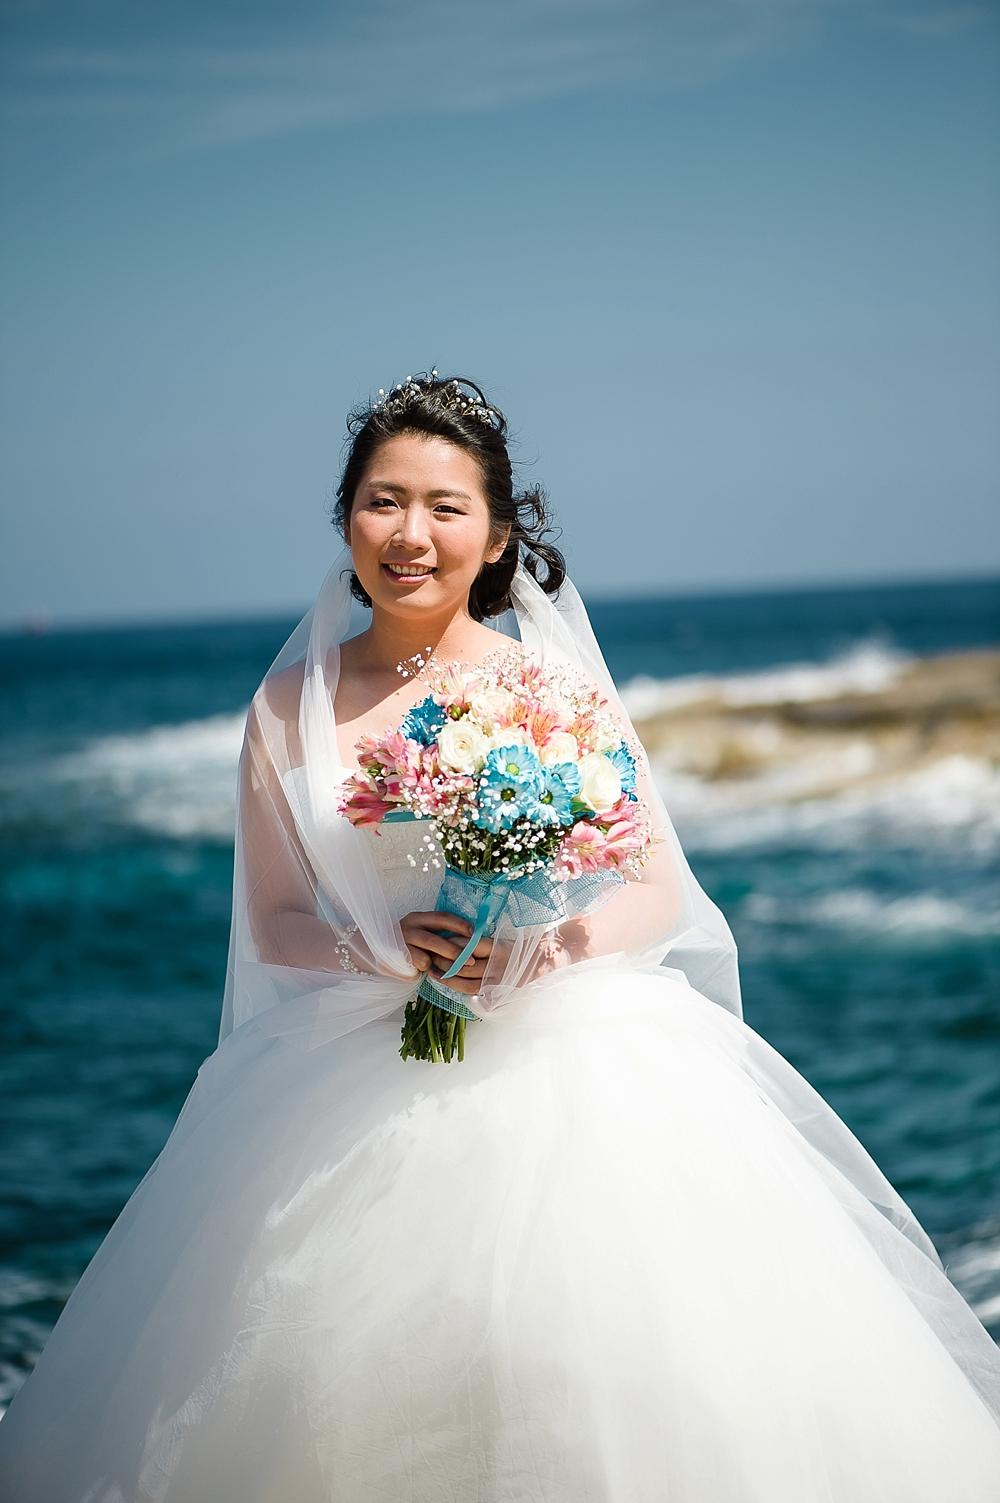 Yeszi & Mingyang - Destination Wedding Malta - Shane P. Watts Photography